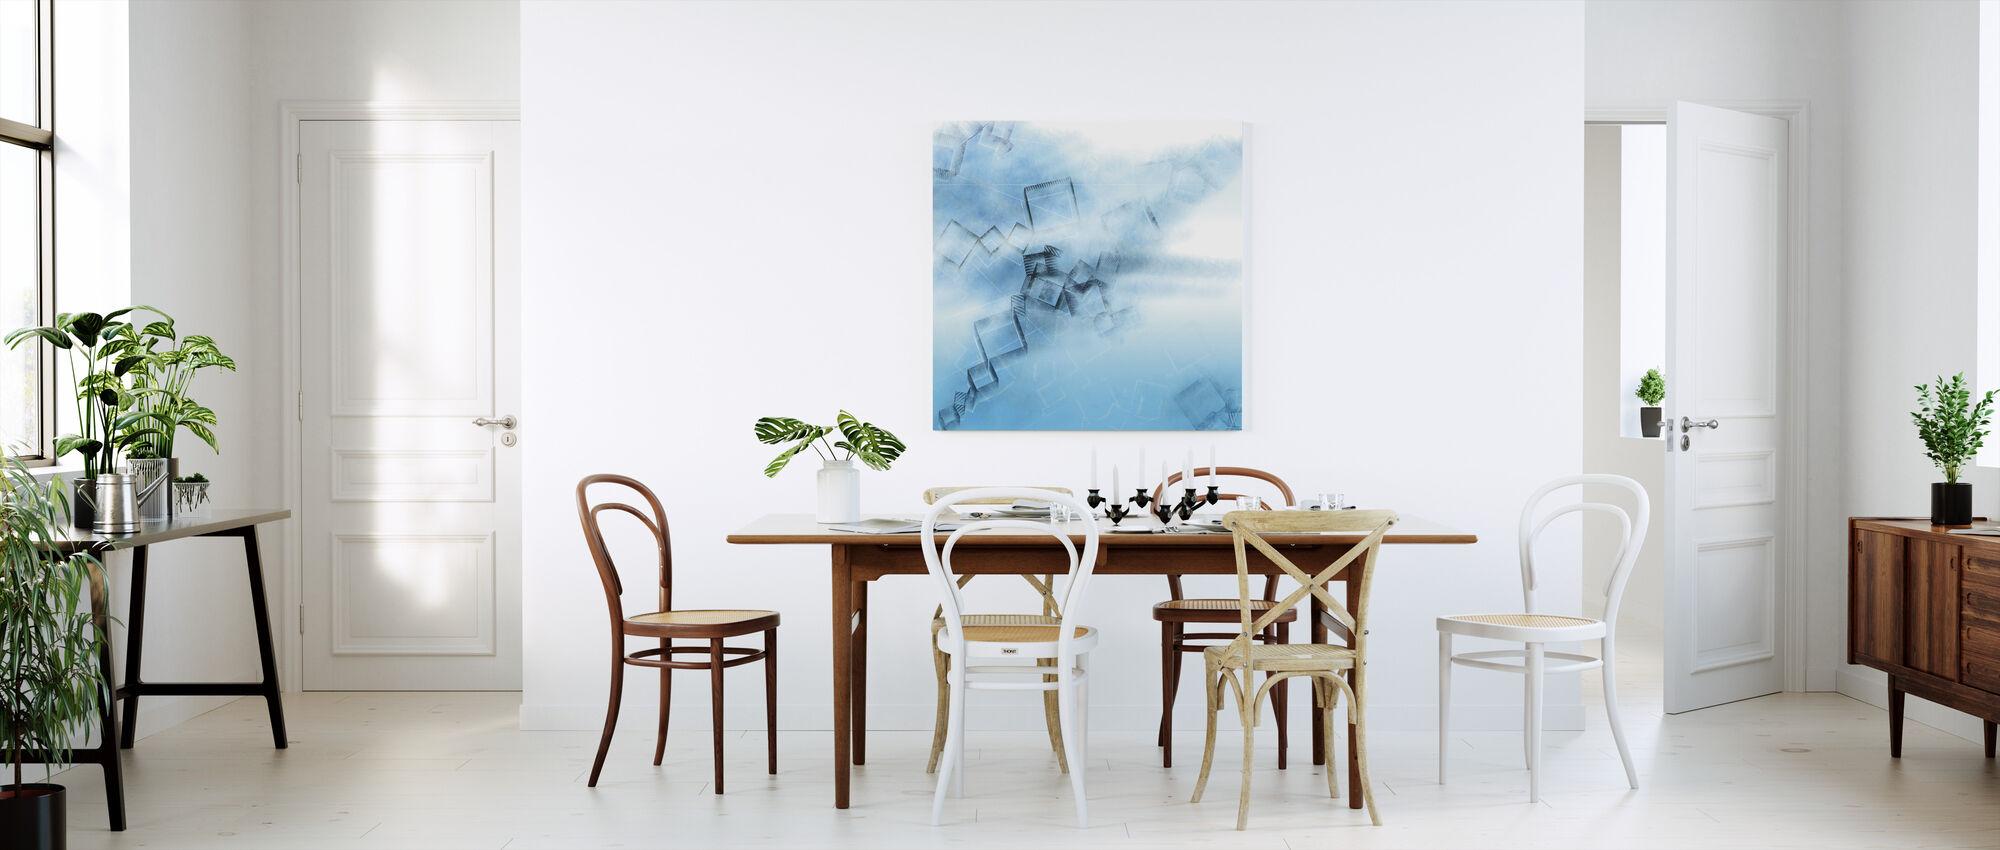 Blauw Spel - Canvas print - Keuken